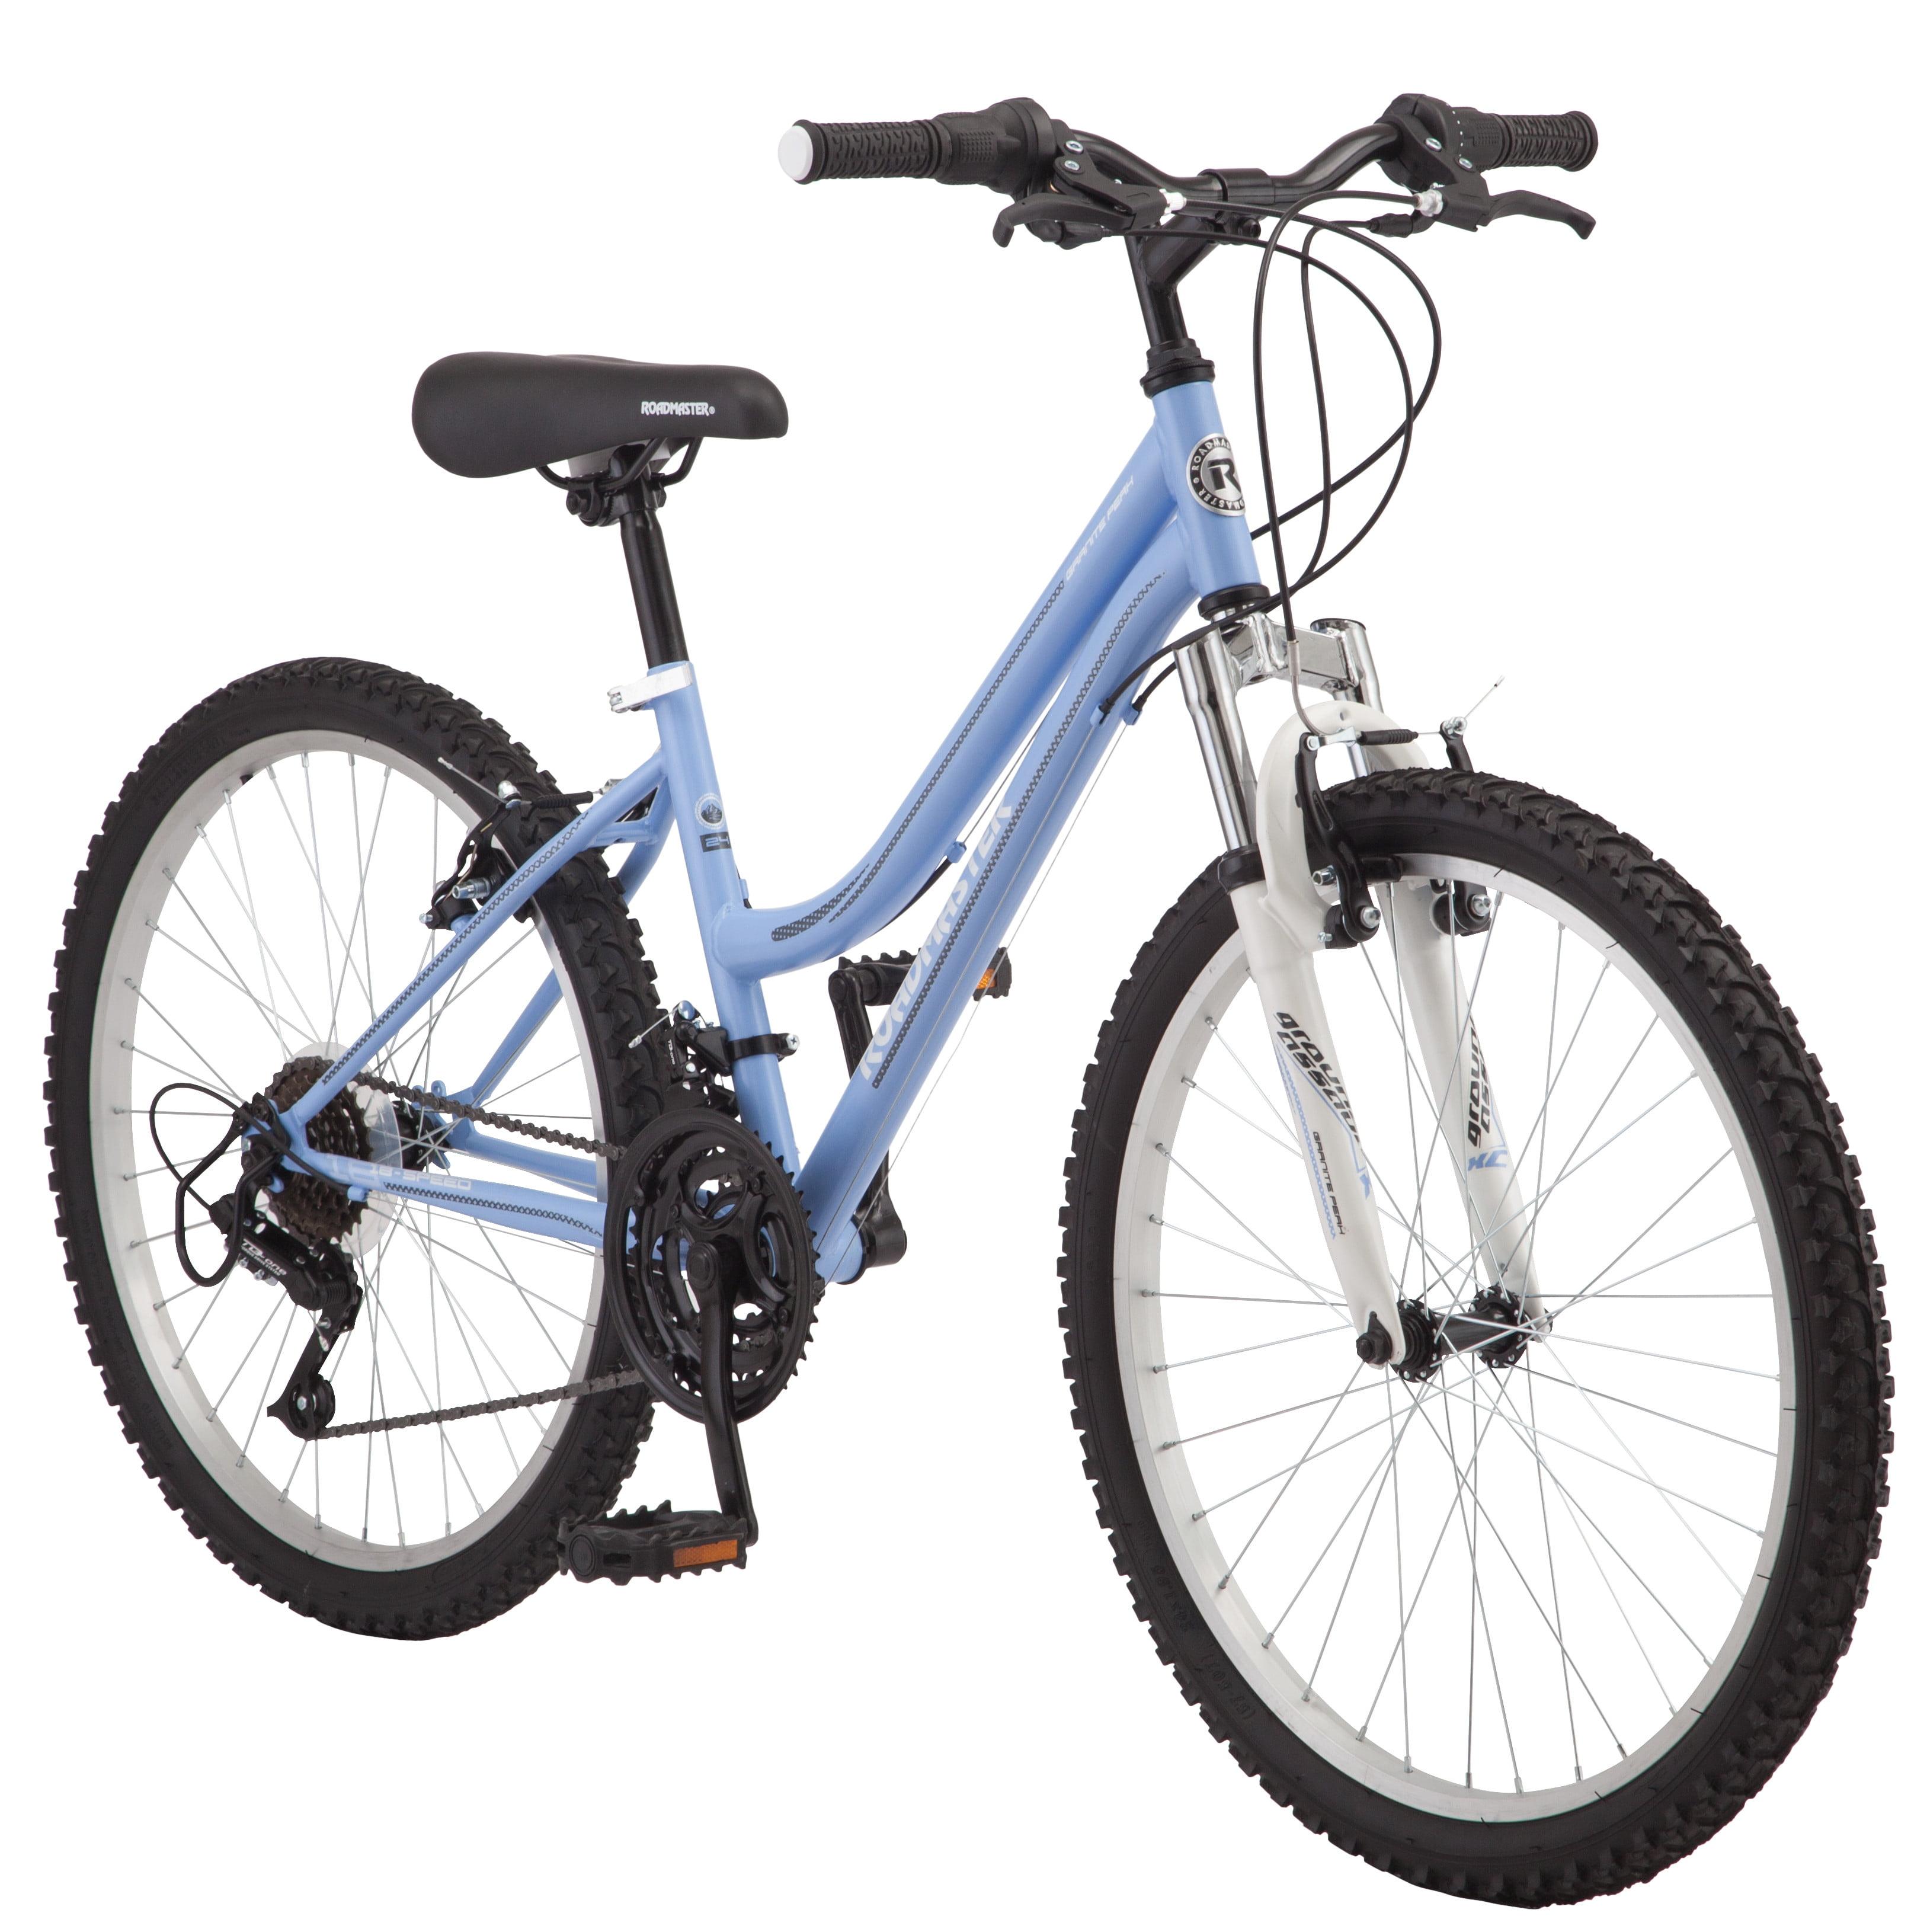 "Roadmaster 24"" Granite Peak Girls Mountain Bike, Light Blue by Pacific Cycle"